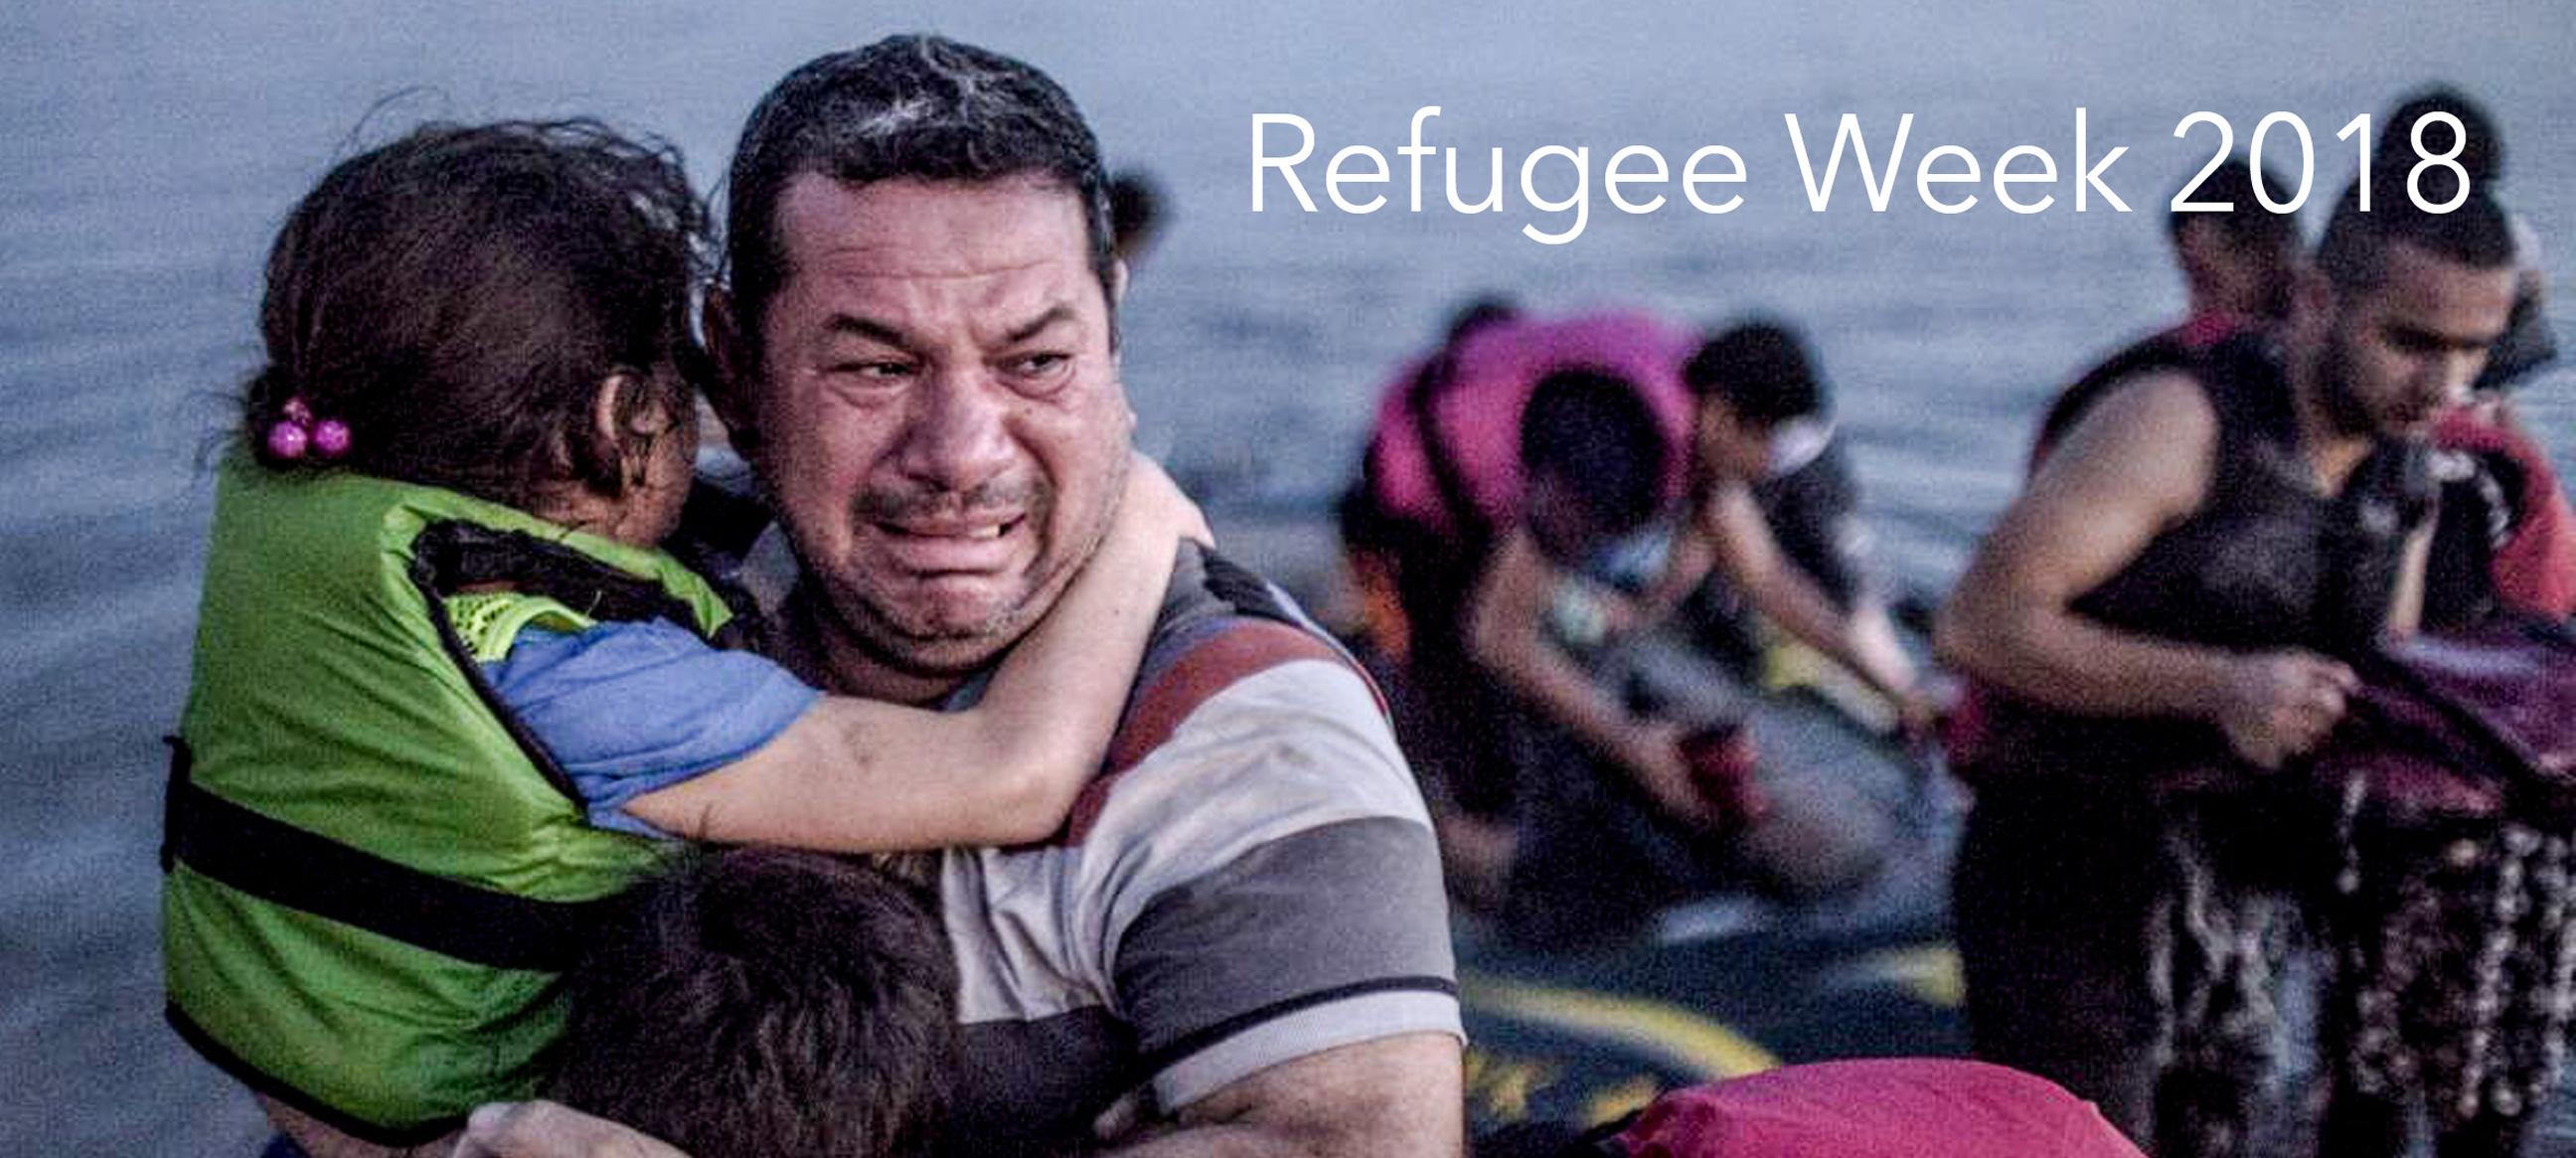 Refugee Week 2018